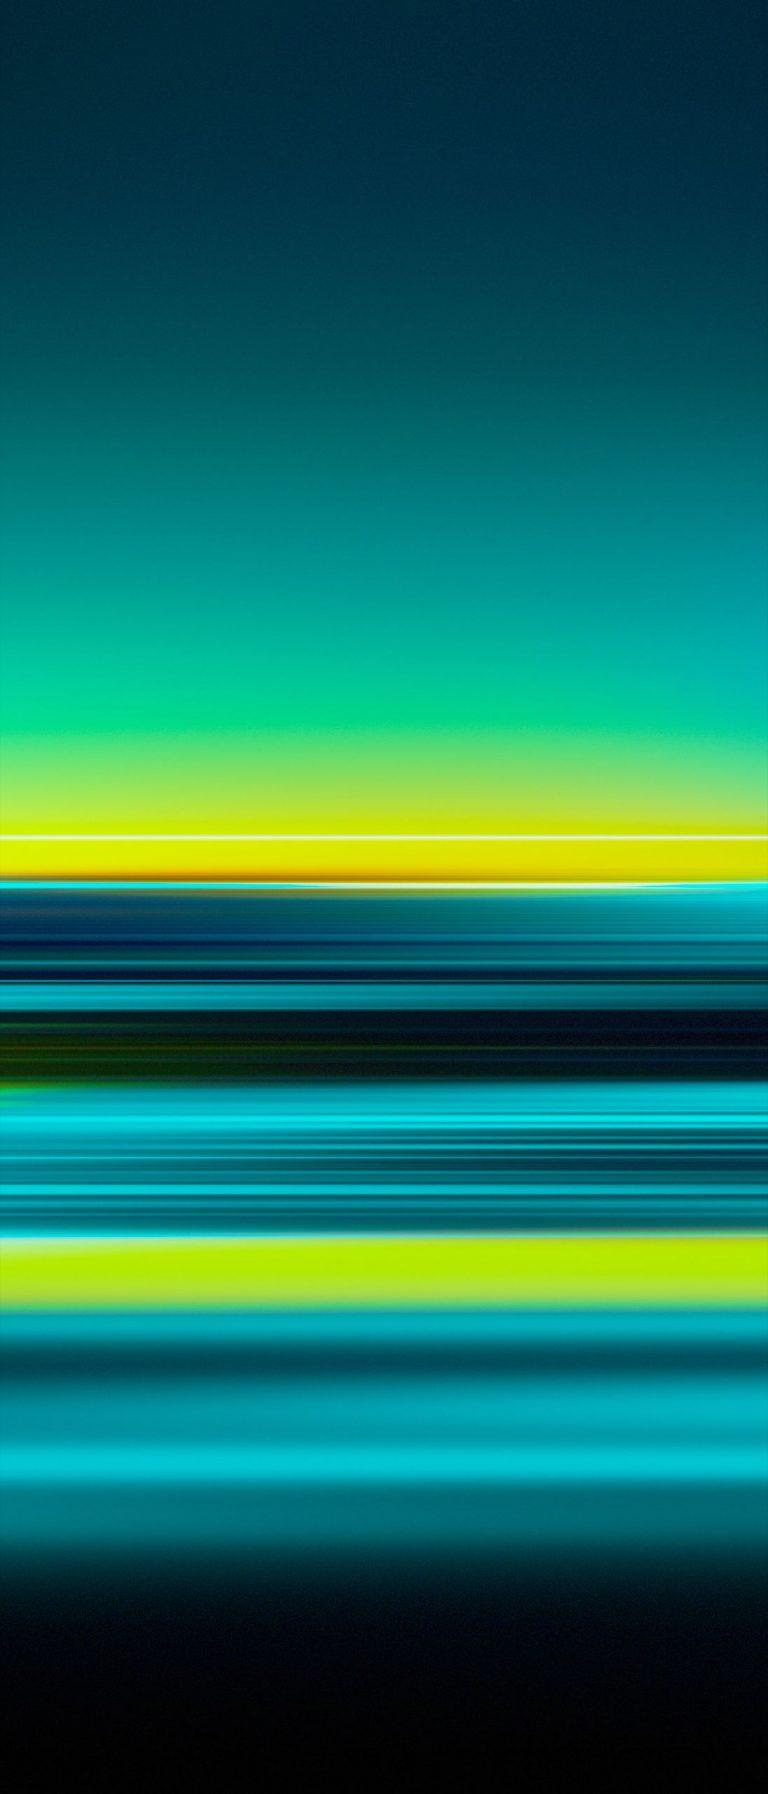 Sony Xperia 1 Stock Wallpaper 03 1096x2560 768x1794